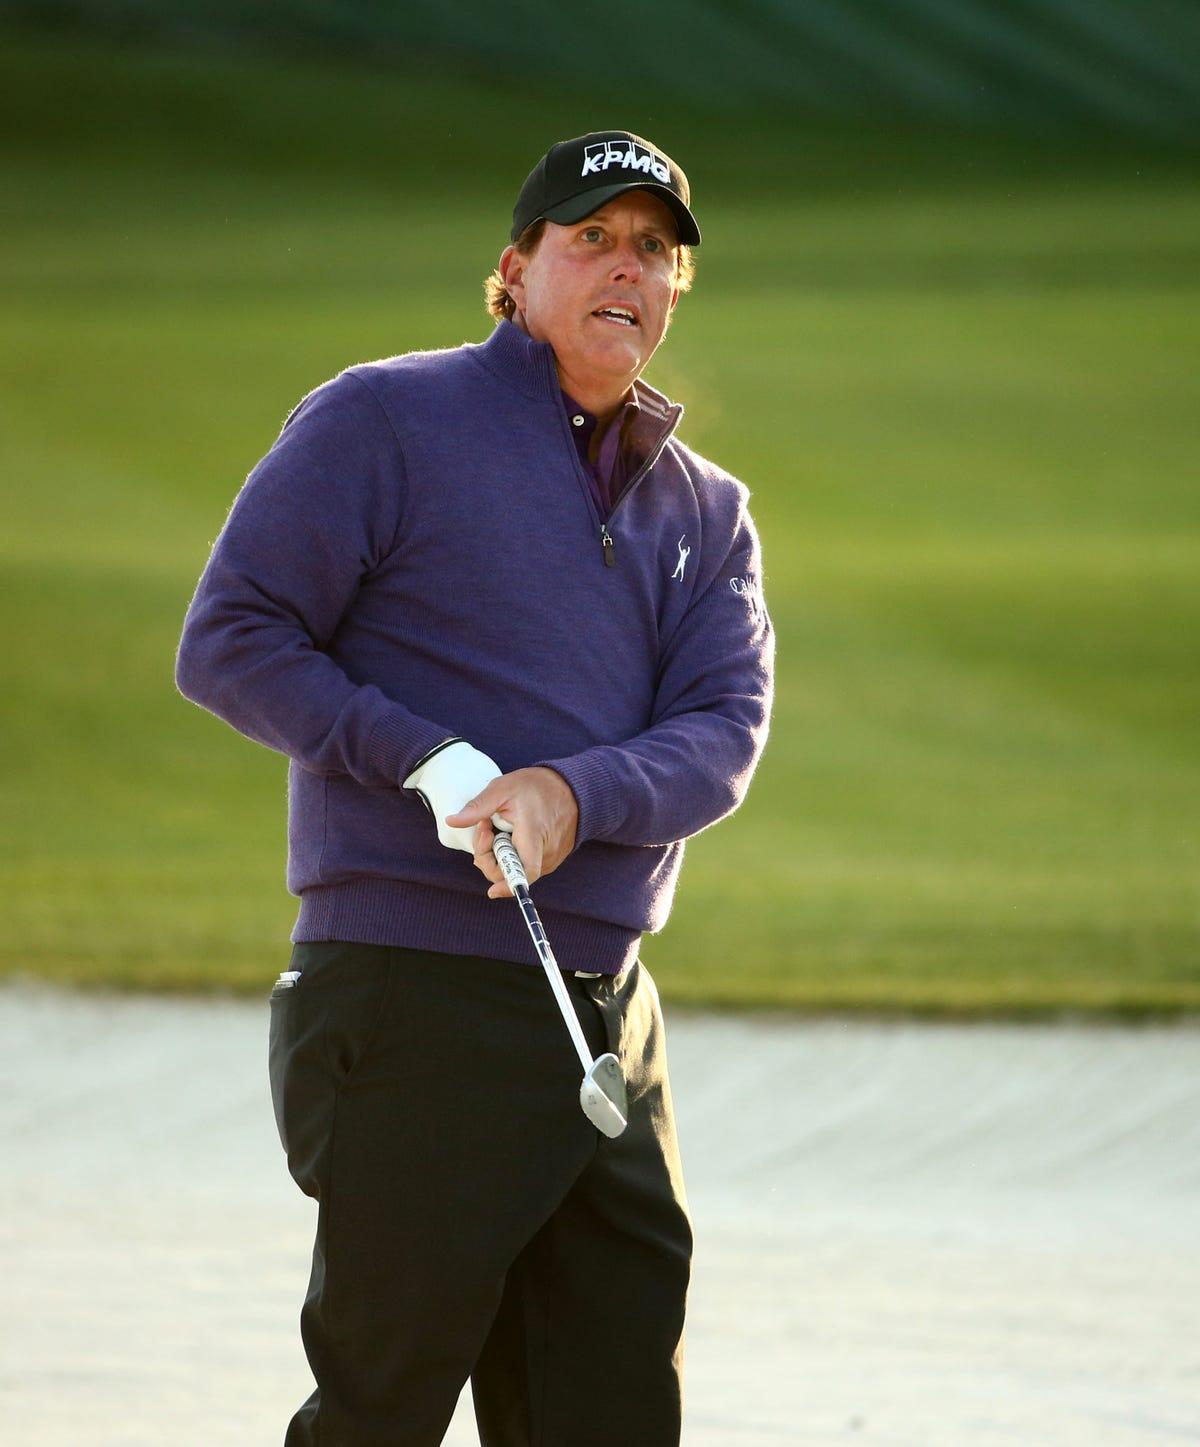 Health, fitness keys to Phil Mickelson's longevity